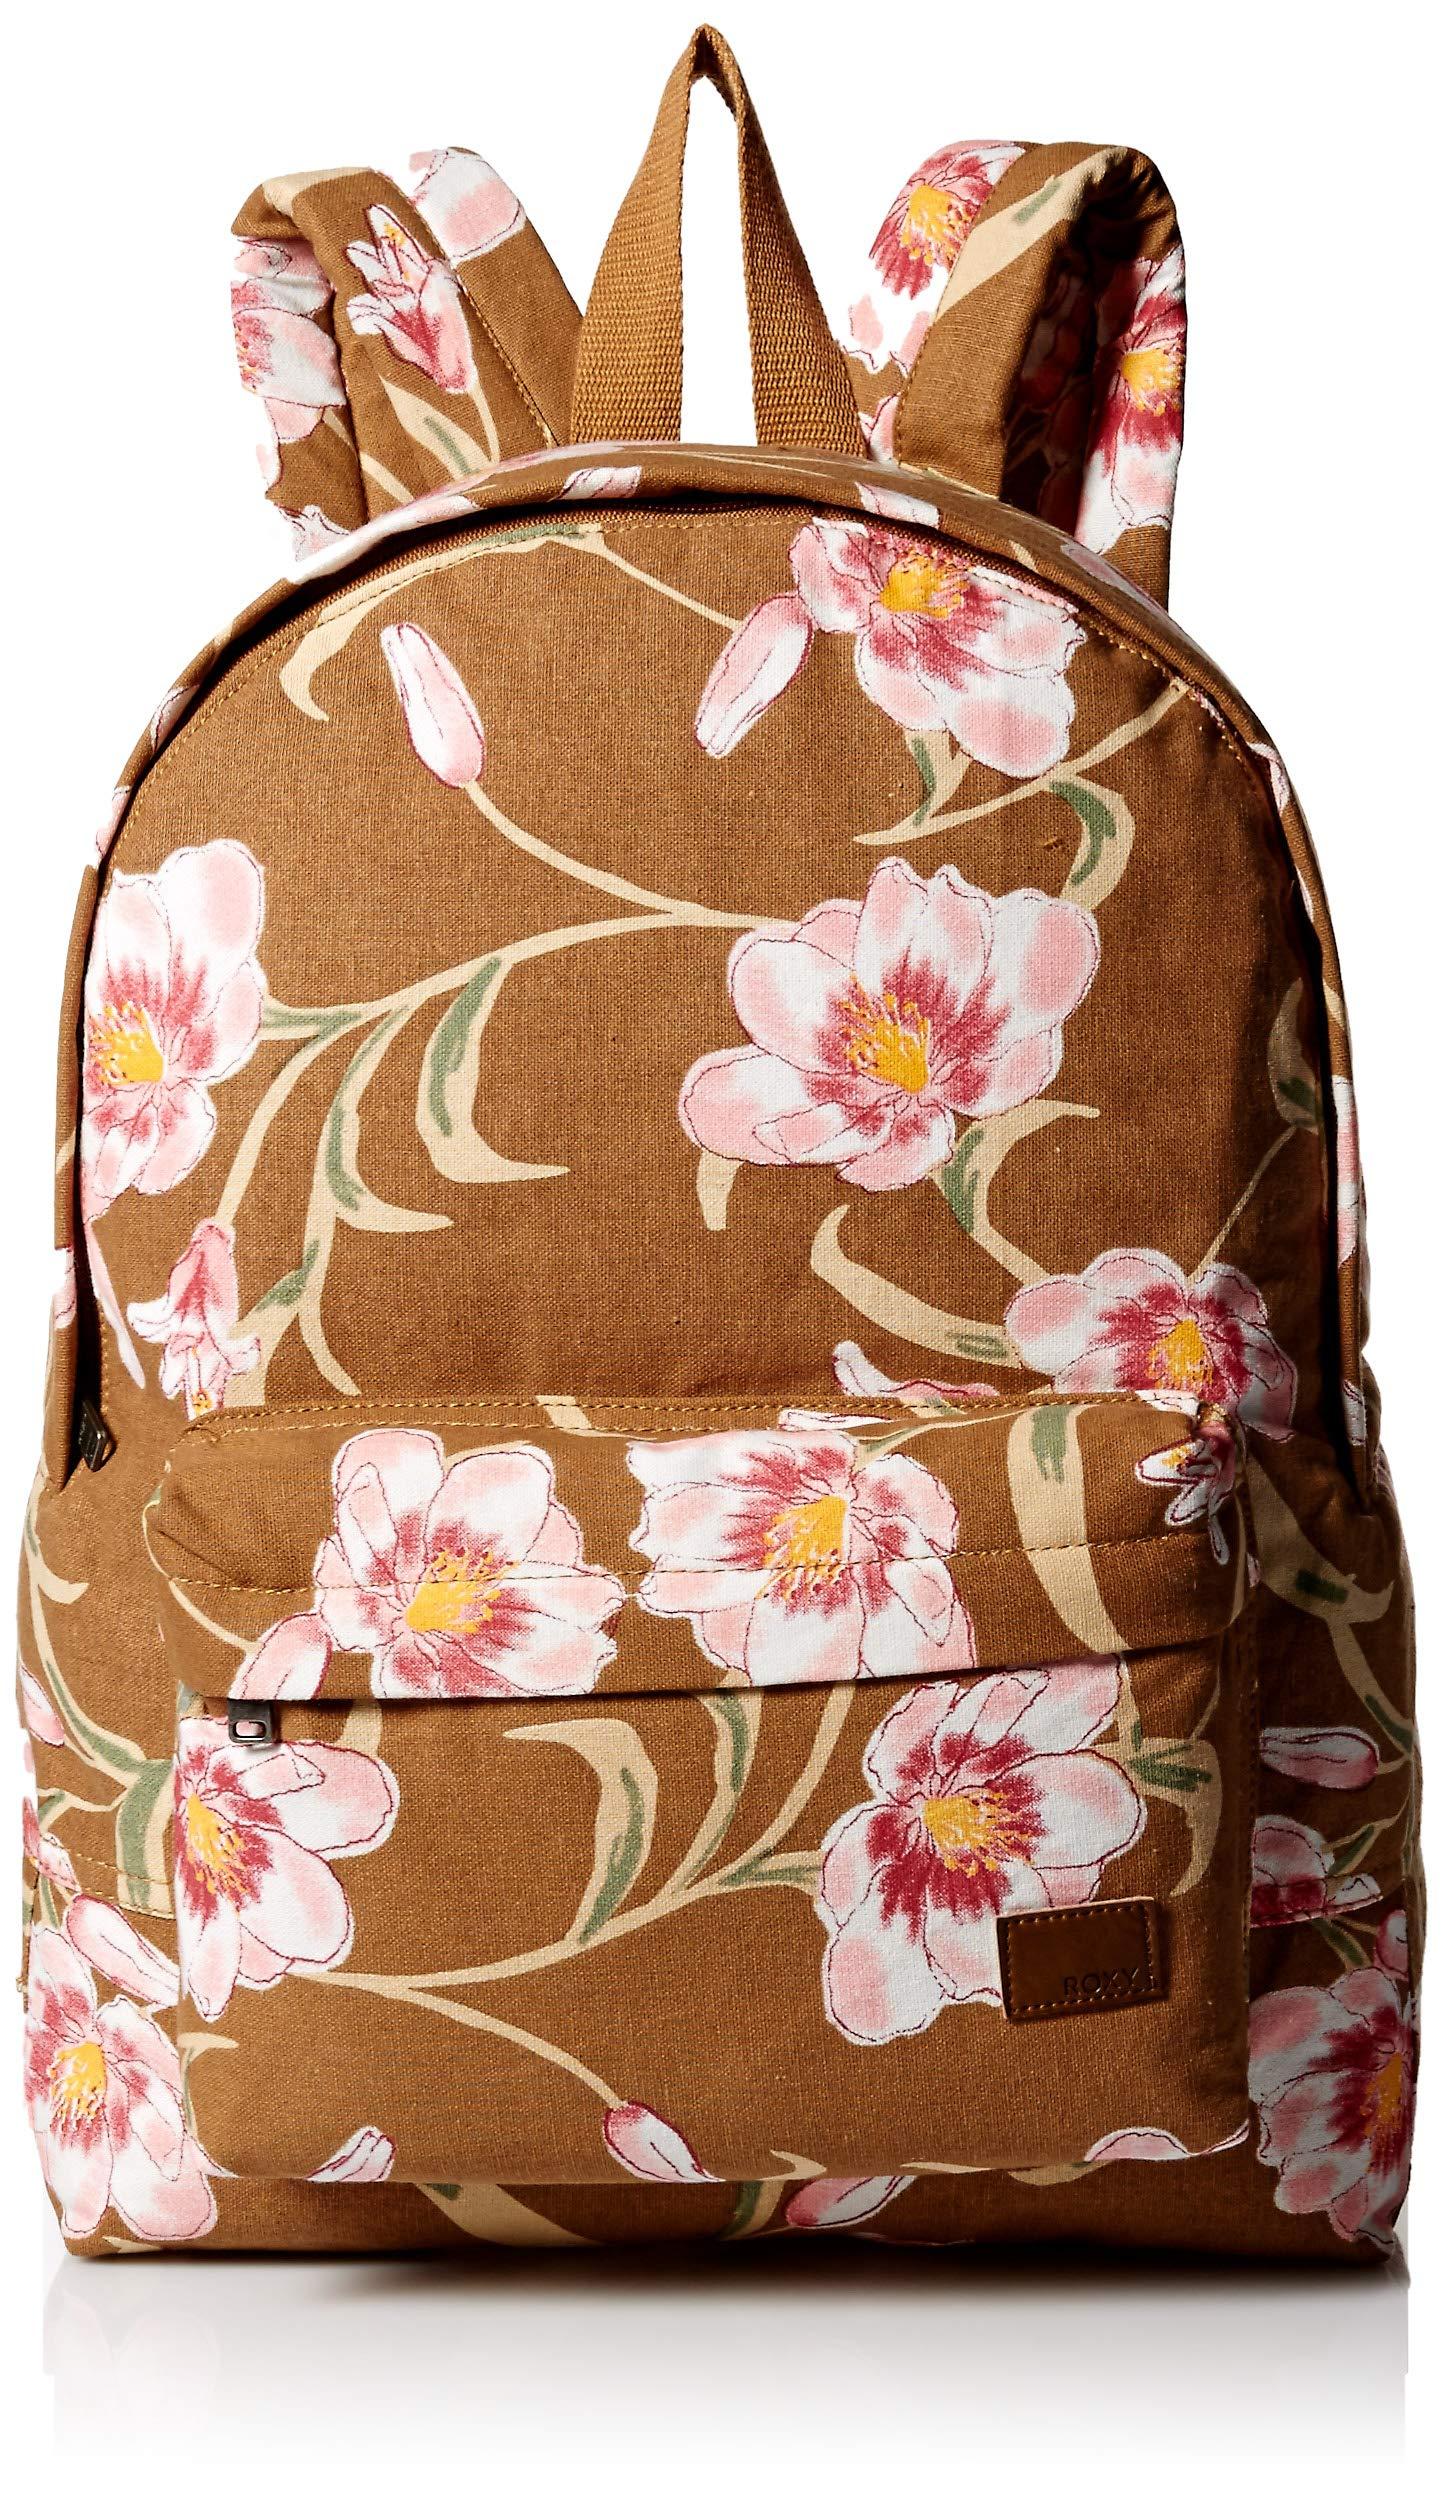 Roxy Women's Sugay Baby Canvas Backpack, chipmunk SURFIN love, 1SZ by Roxy